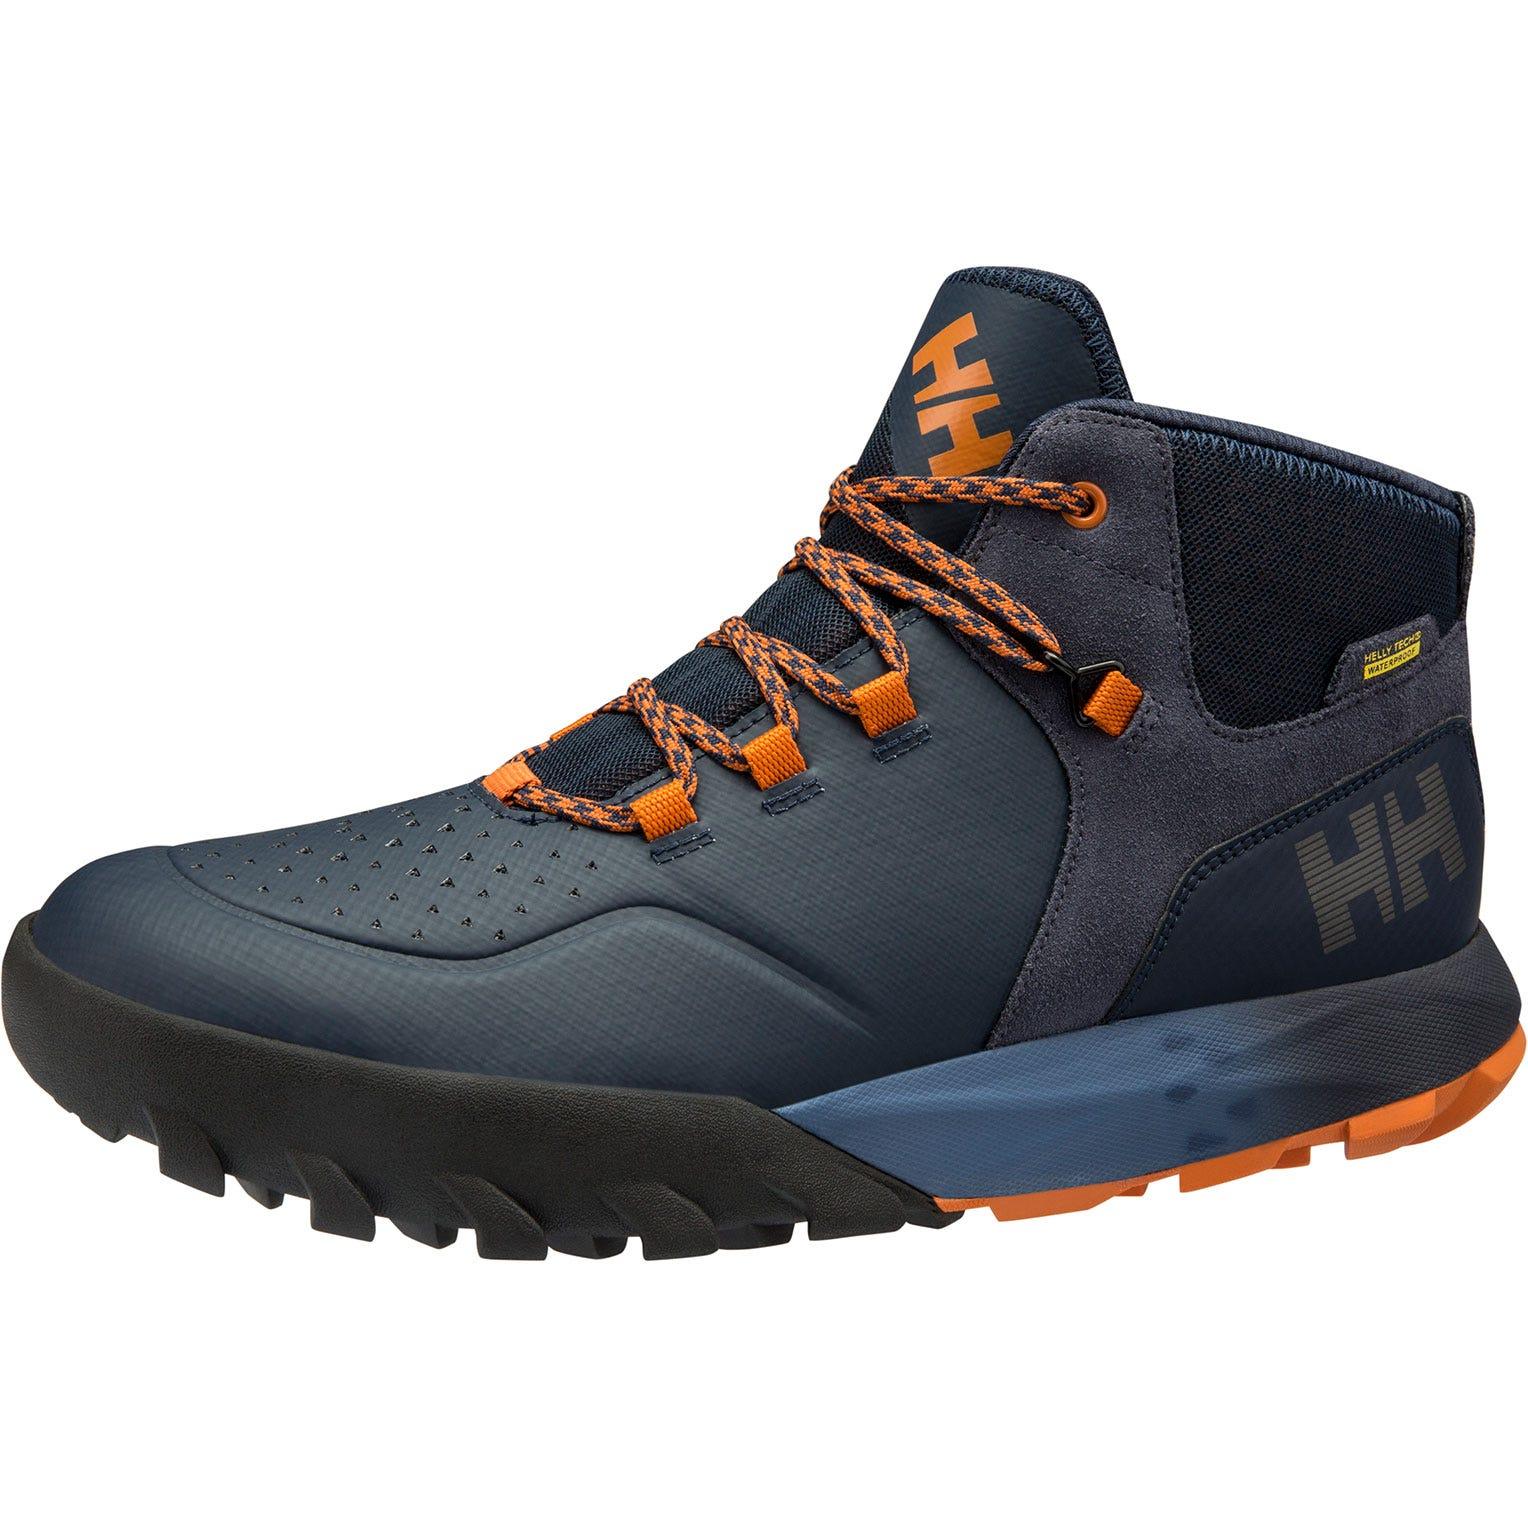 Helly Hansen Loke Rambler Ht Mens Hiking Boot Navy 44/10